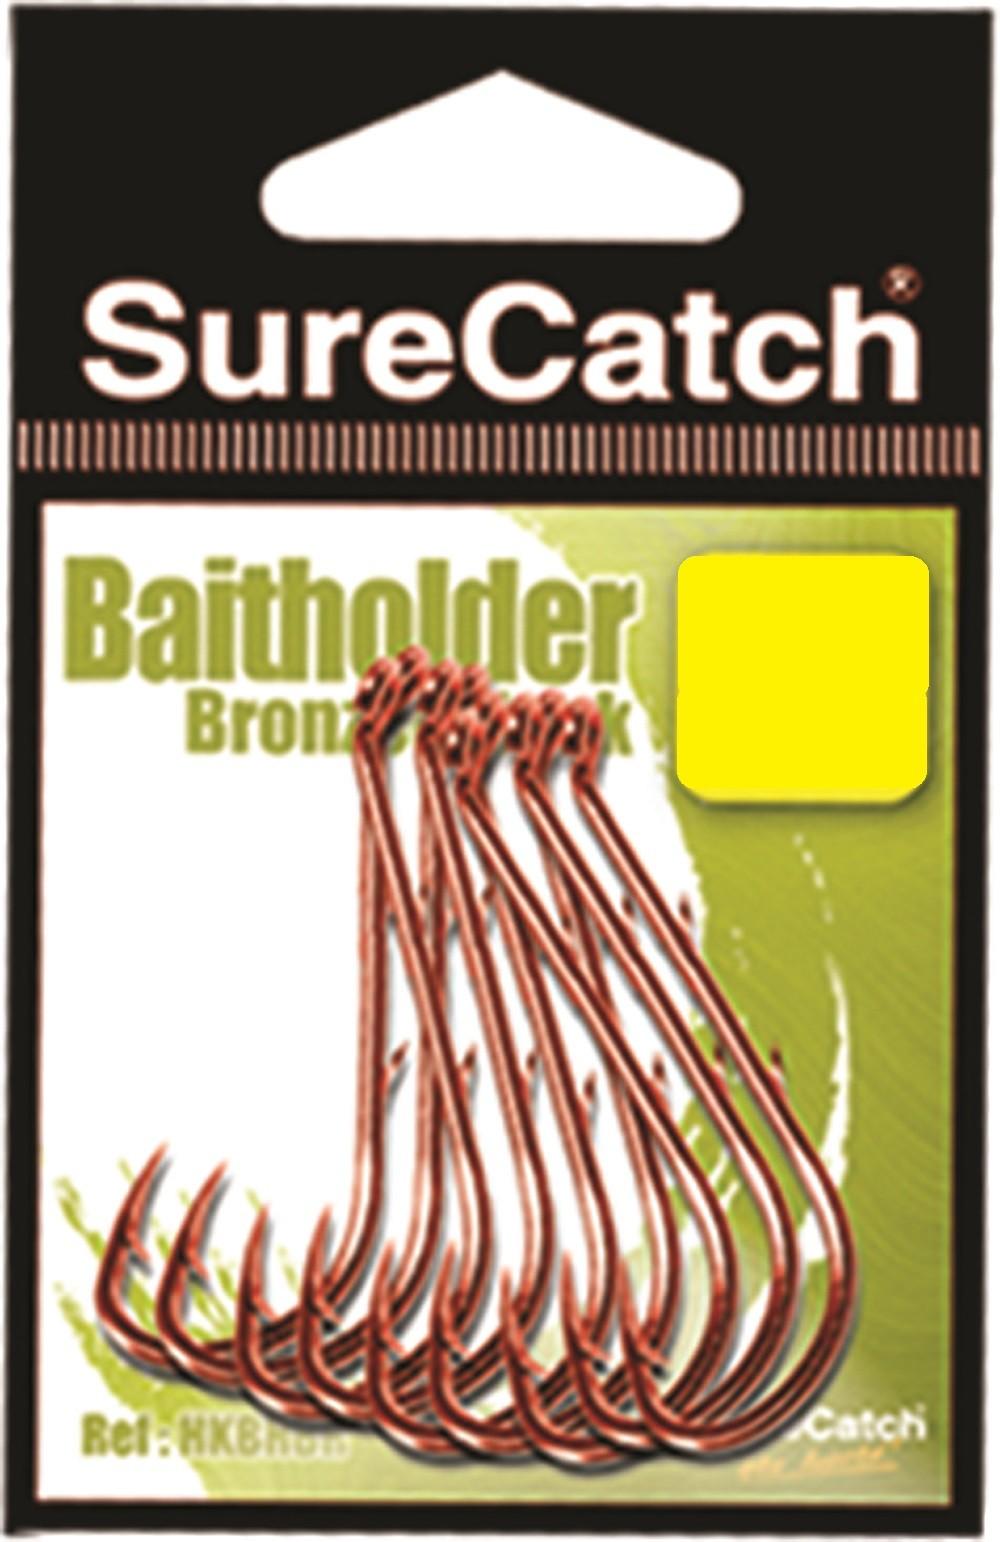 Sure Catch Bronze Baitholder Hook (7 per Pack) - Size 2/0